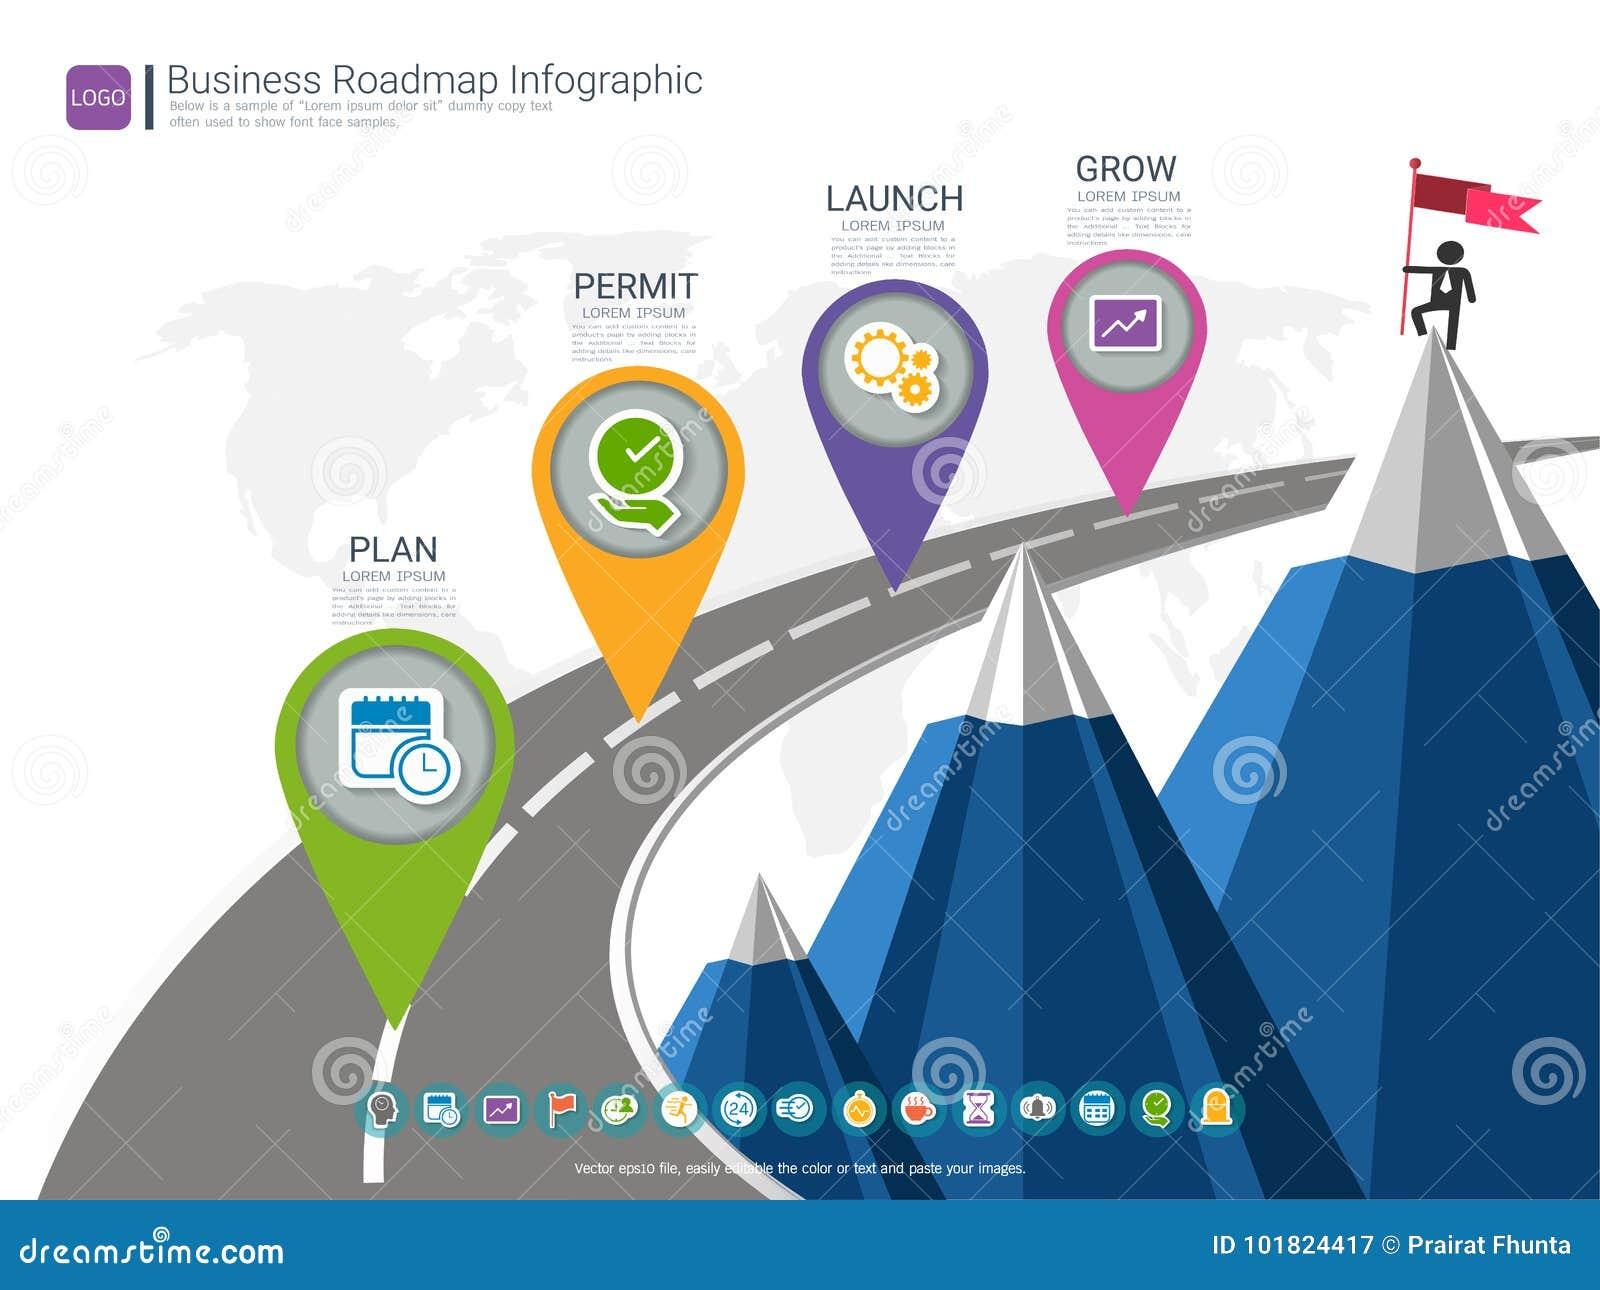 Infographic πρότυπο σχεδίου υπόδειξης ως προς το χρόνο Roadmap, βασικές επιτυχία και παρουσίαση των φιλοδοξιών προγράμματος